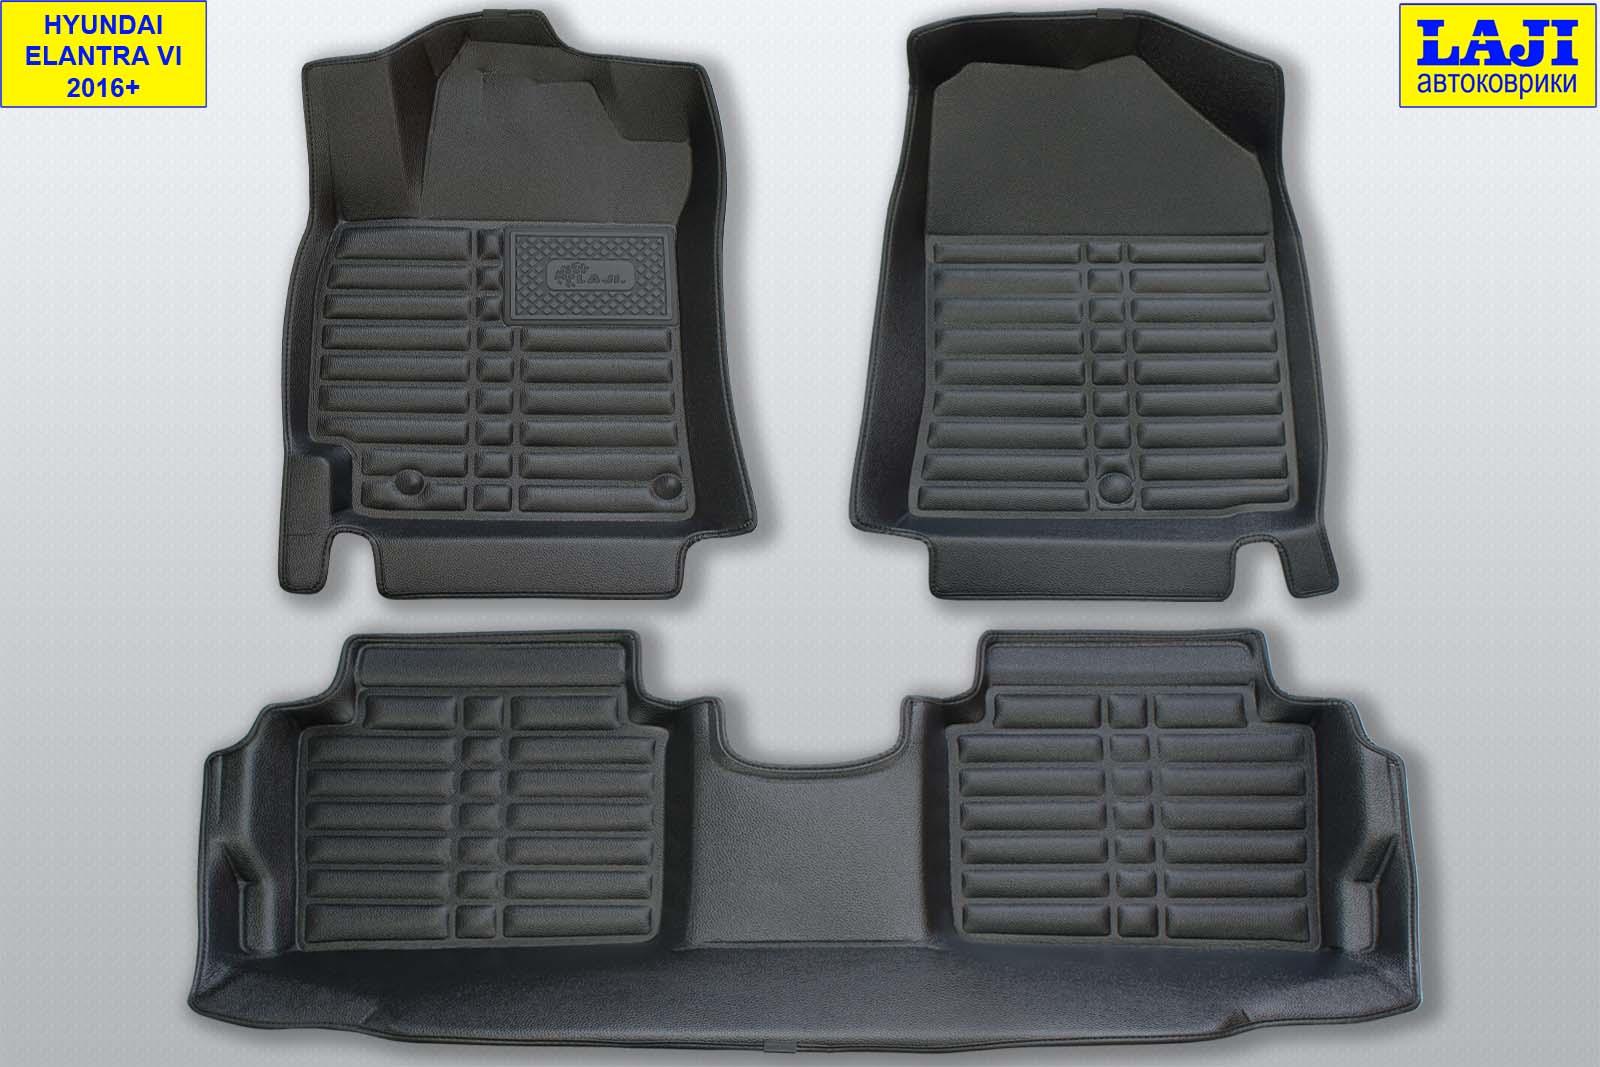 5D коврики в салон Hyundai Elantra 6 AD 2016-2020 1